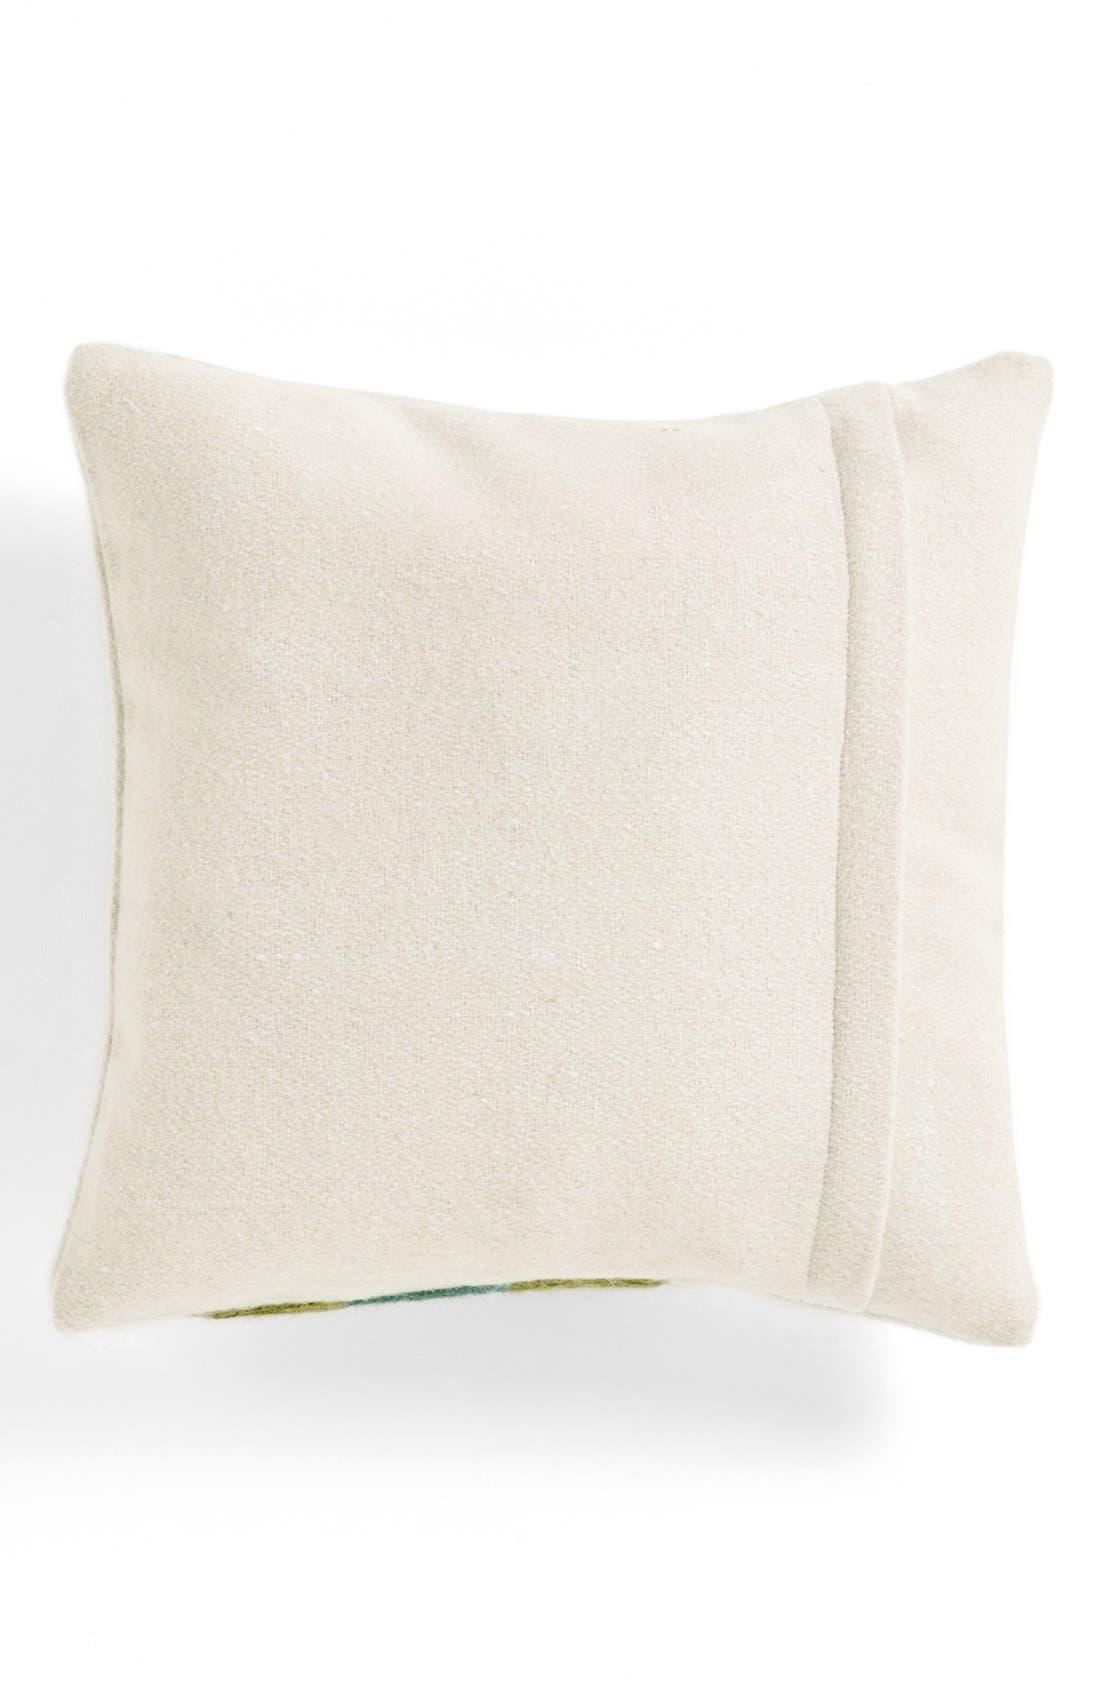 Alternate Image 2  - Amity Home 'Alligator' Decorative Pillow